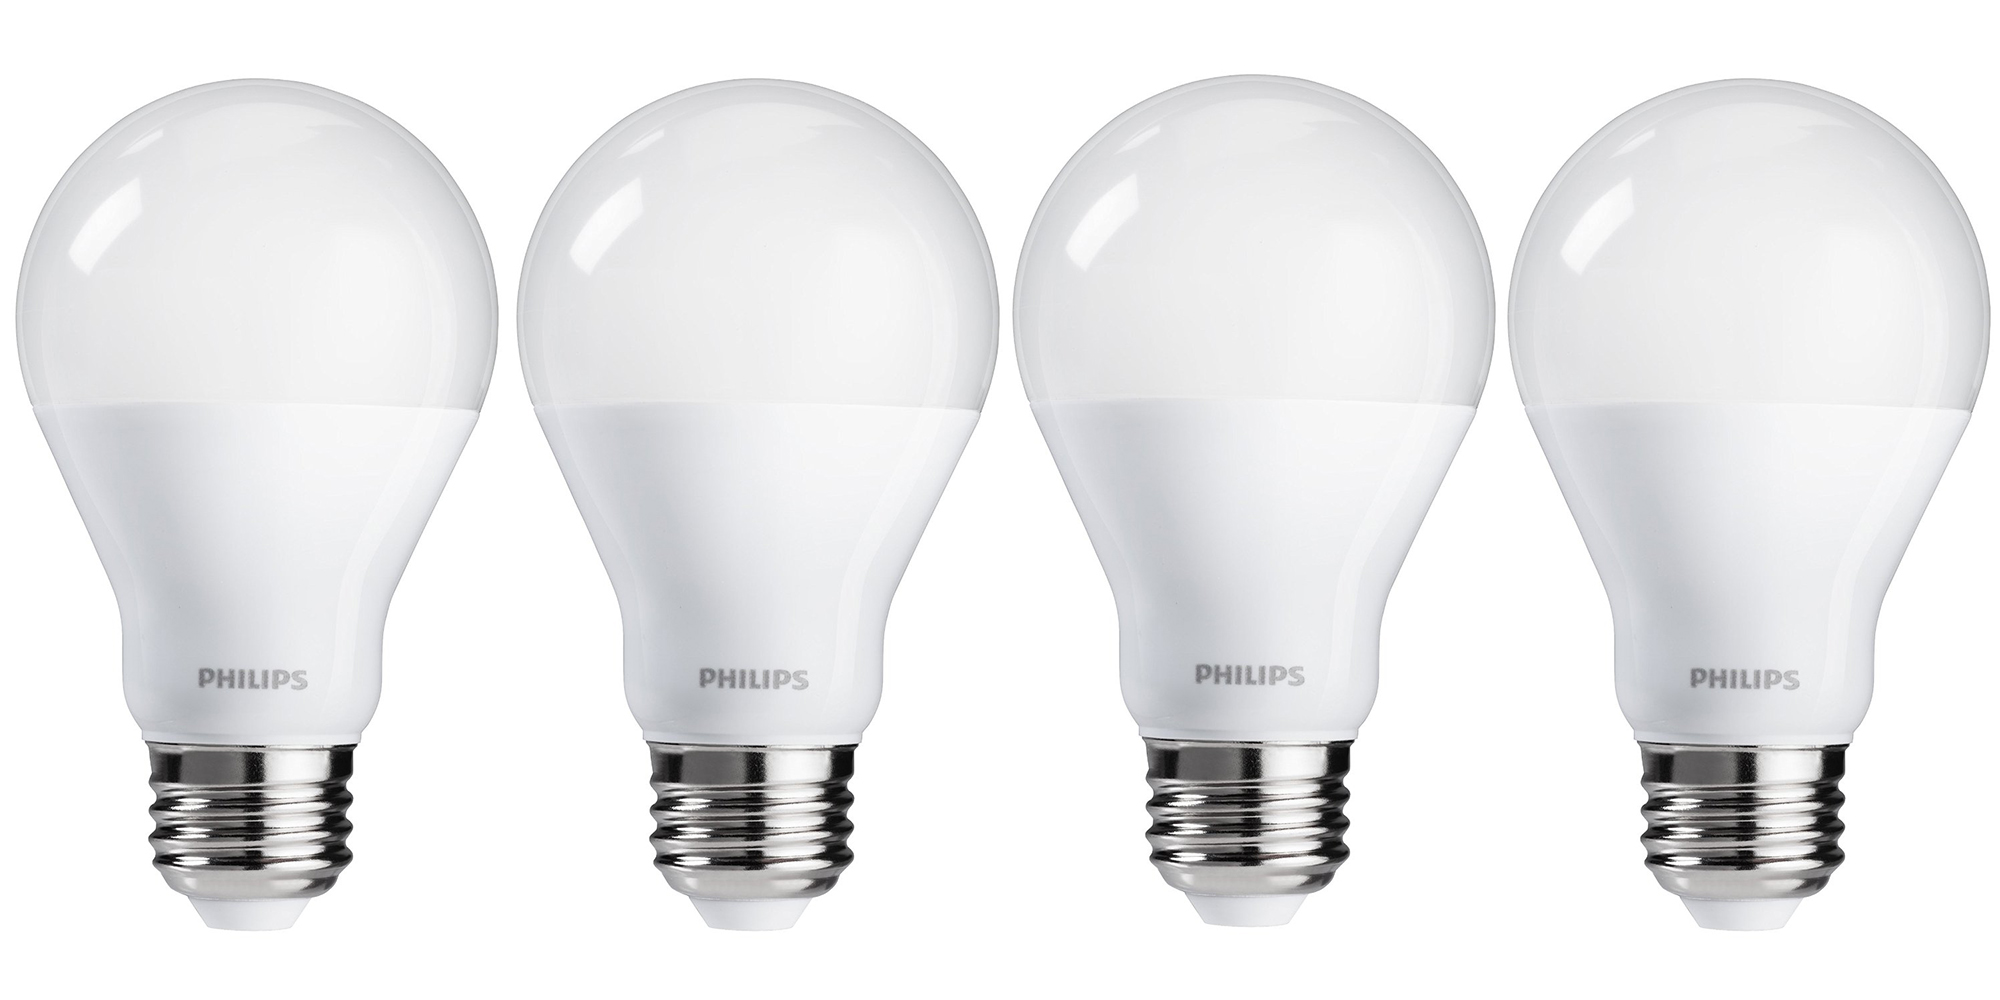 philips-led-light-deals